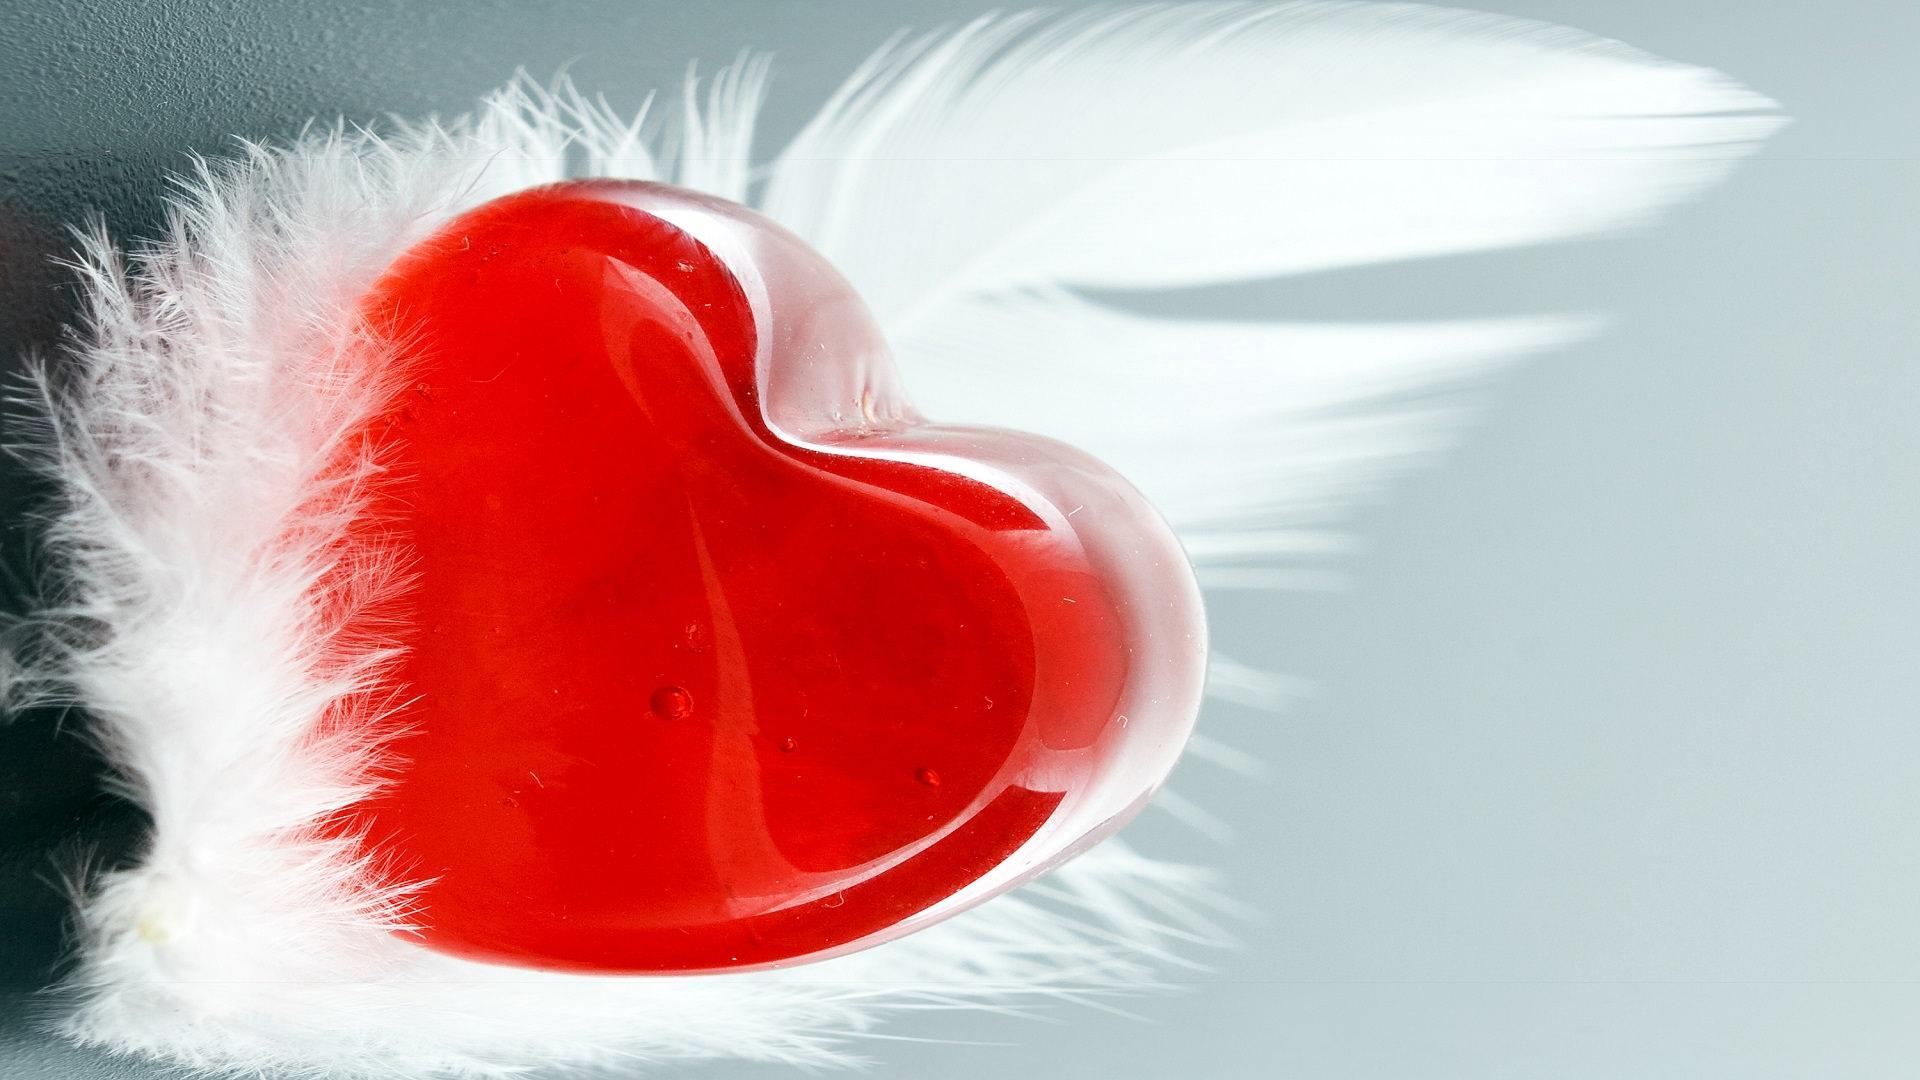 Cute Heart Wallpapers Top Free Cute Heart Backgrounds